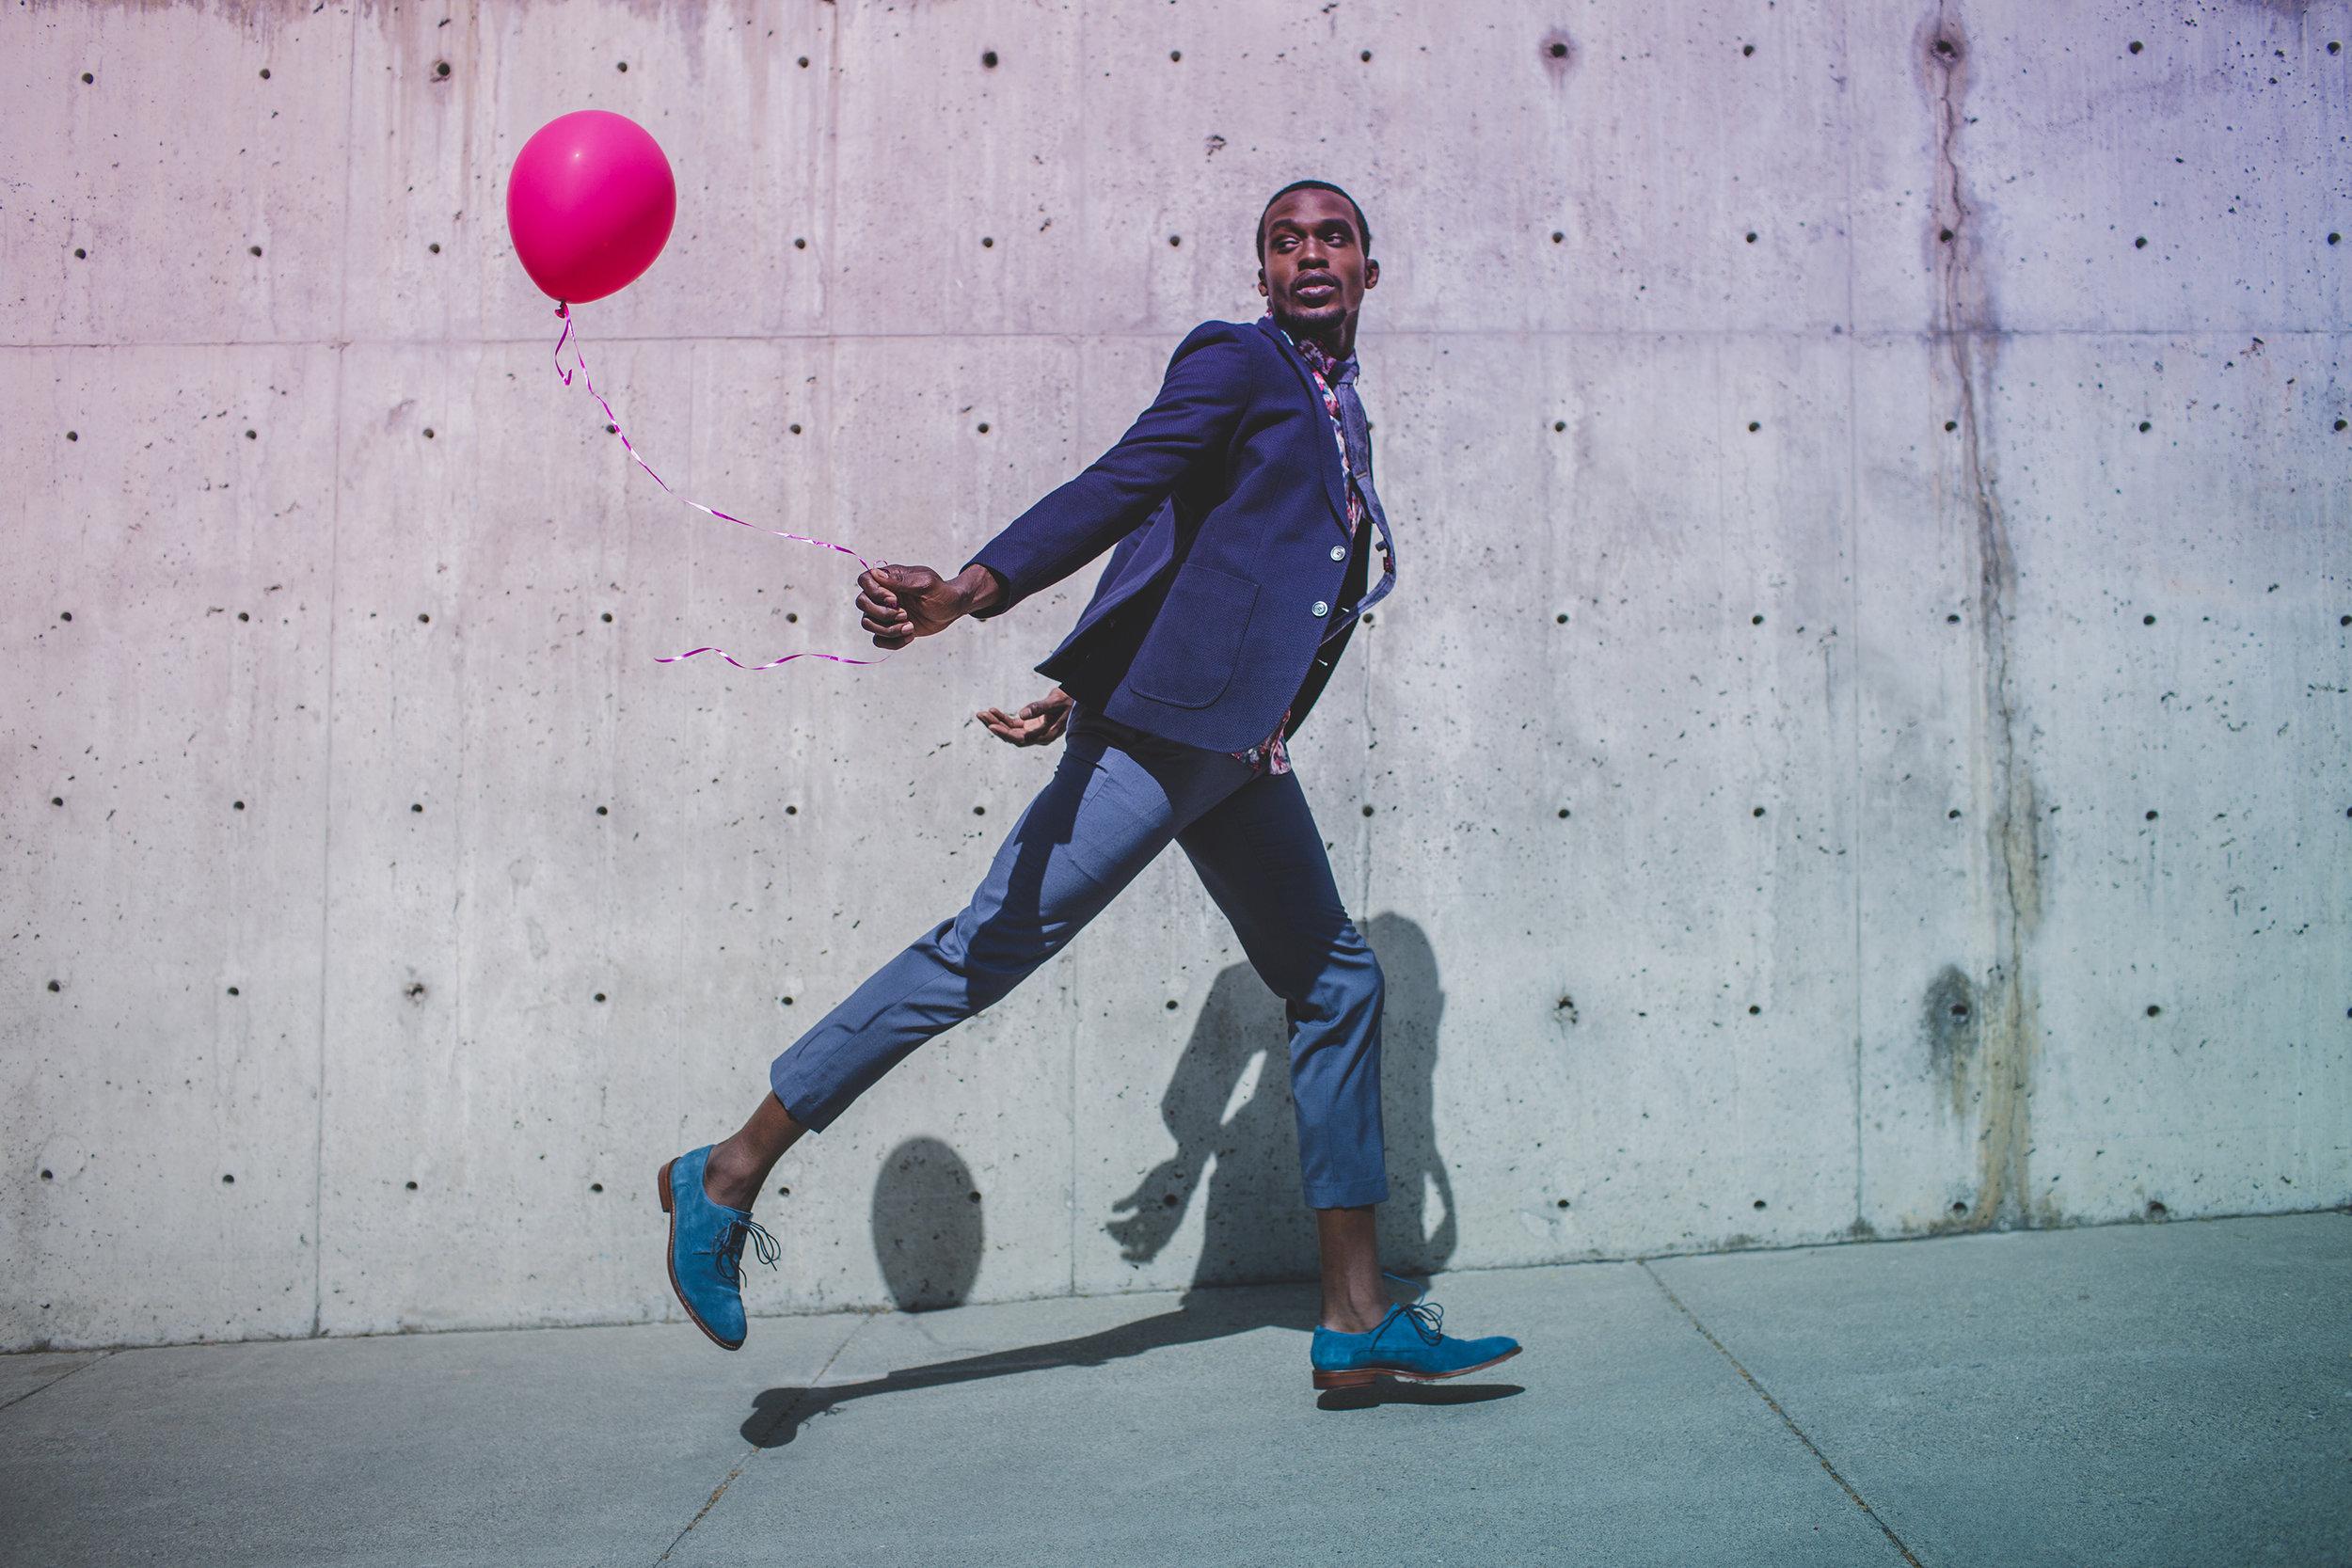 © duston-todd-menswear-suit-balloon-menswear-fashion.jpg